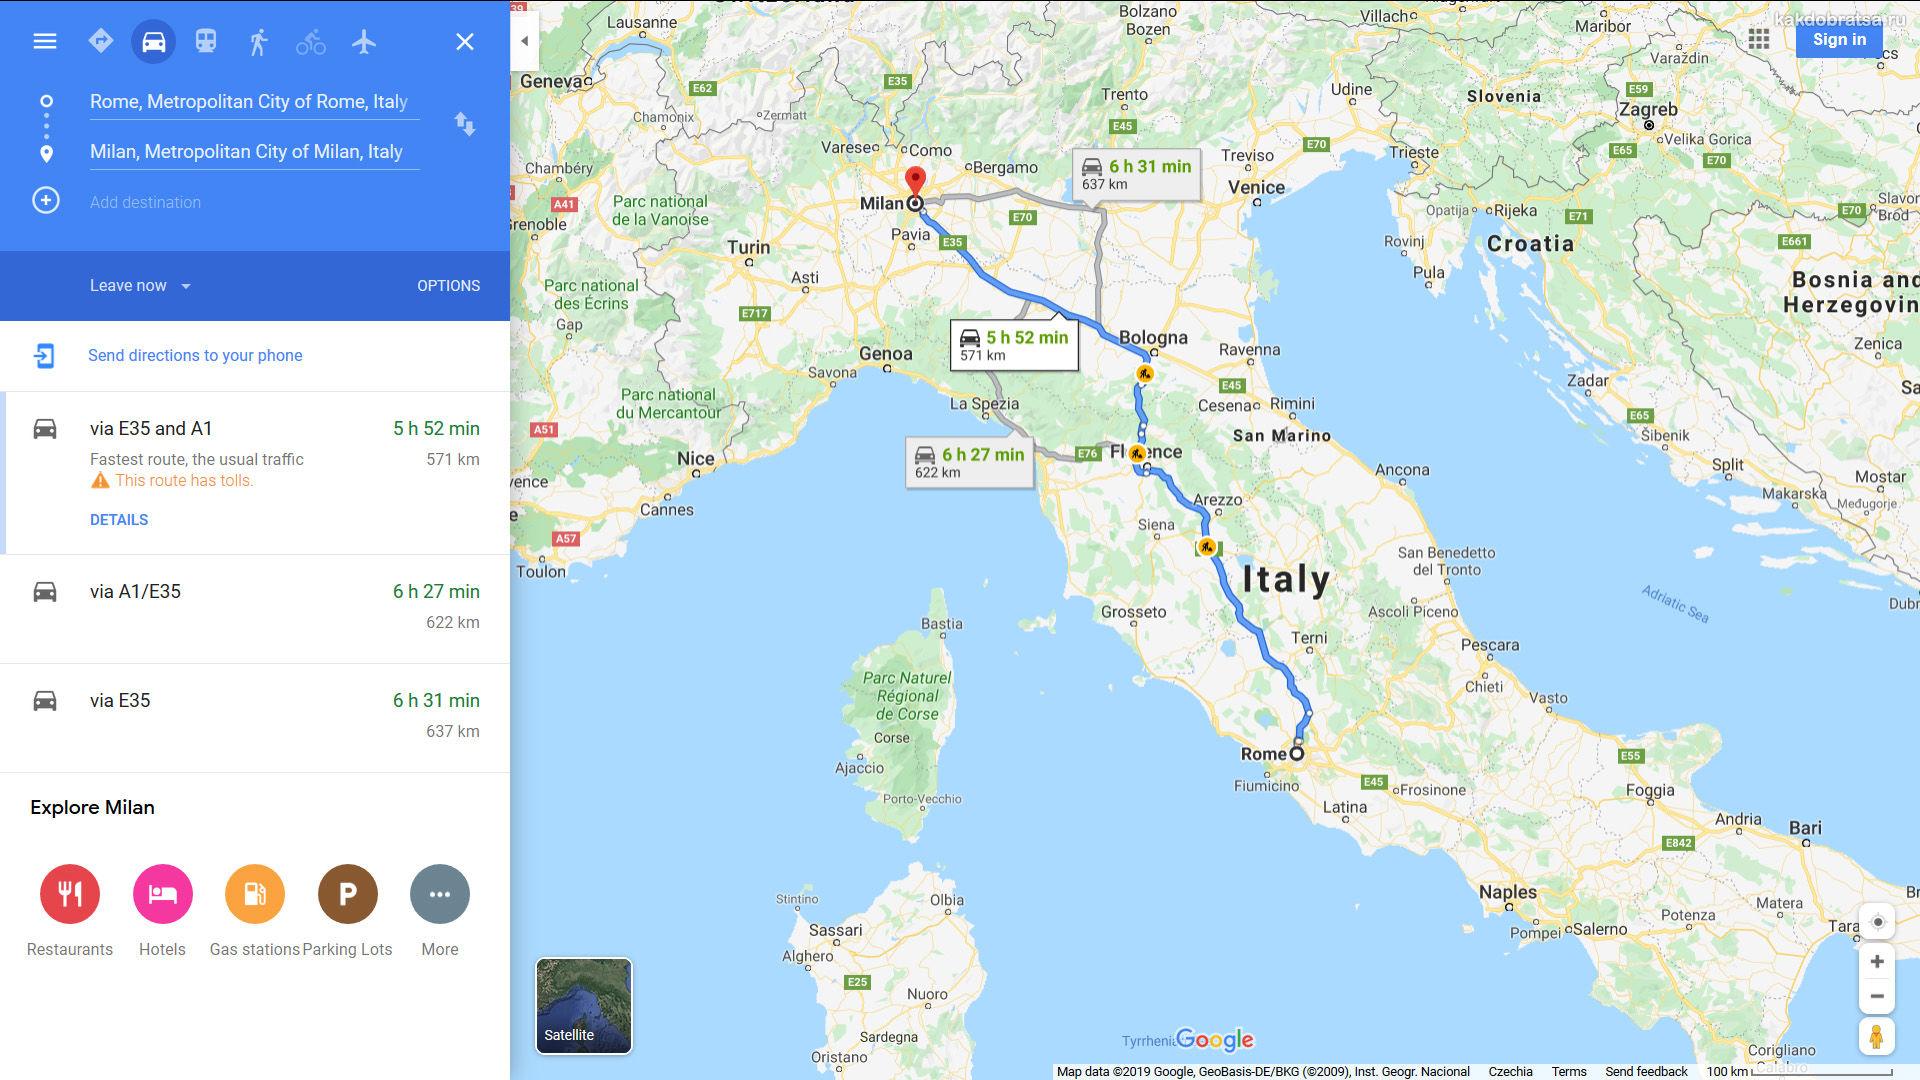 Ииз Рима в Милан время в пути и расстояние